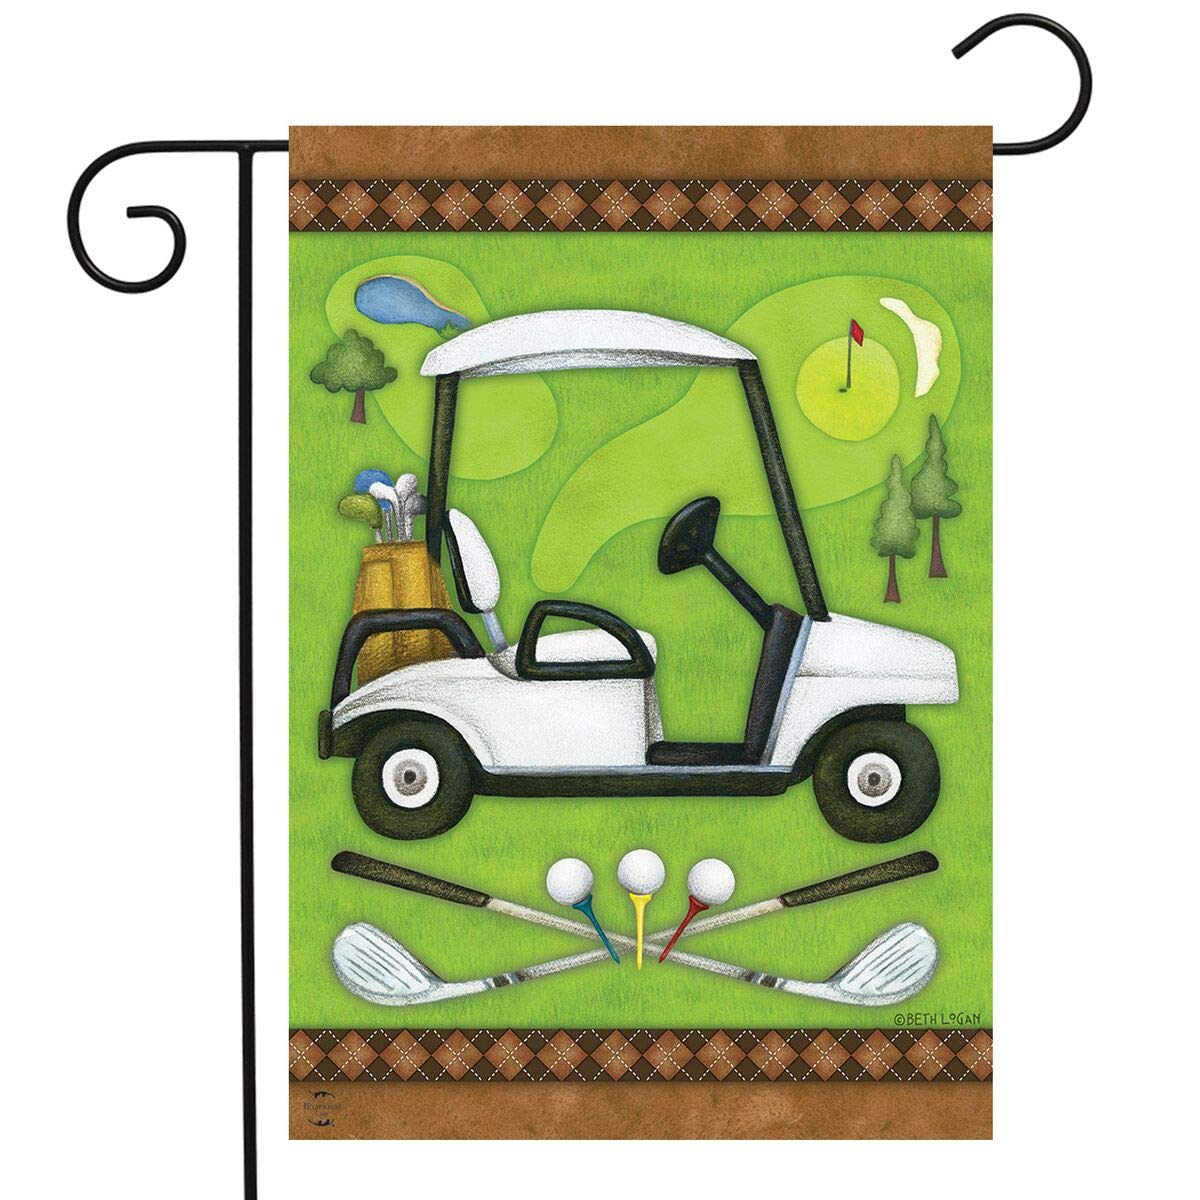 "Briarwood Lane Golf Spring Garden Flag Cart Clubs Sports 12.5"" x 18"""